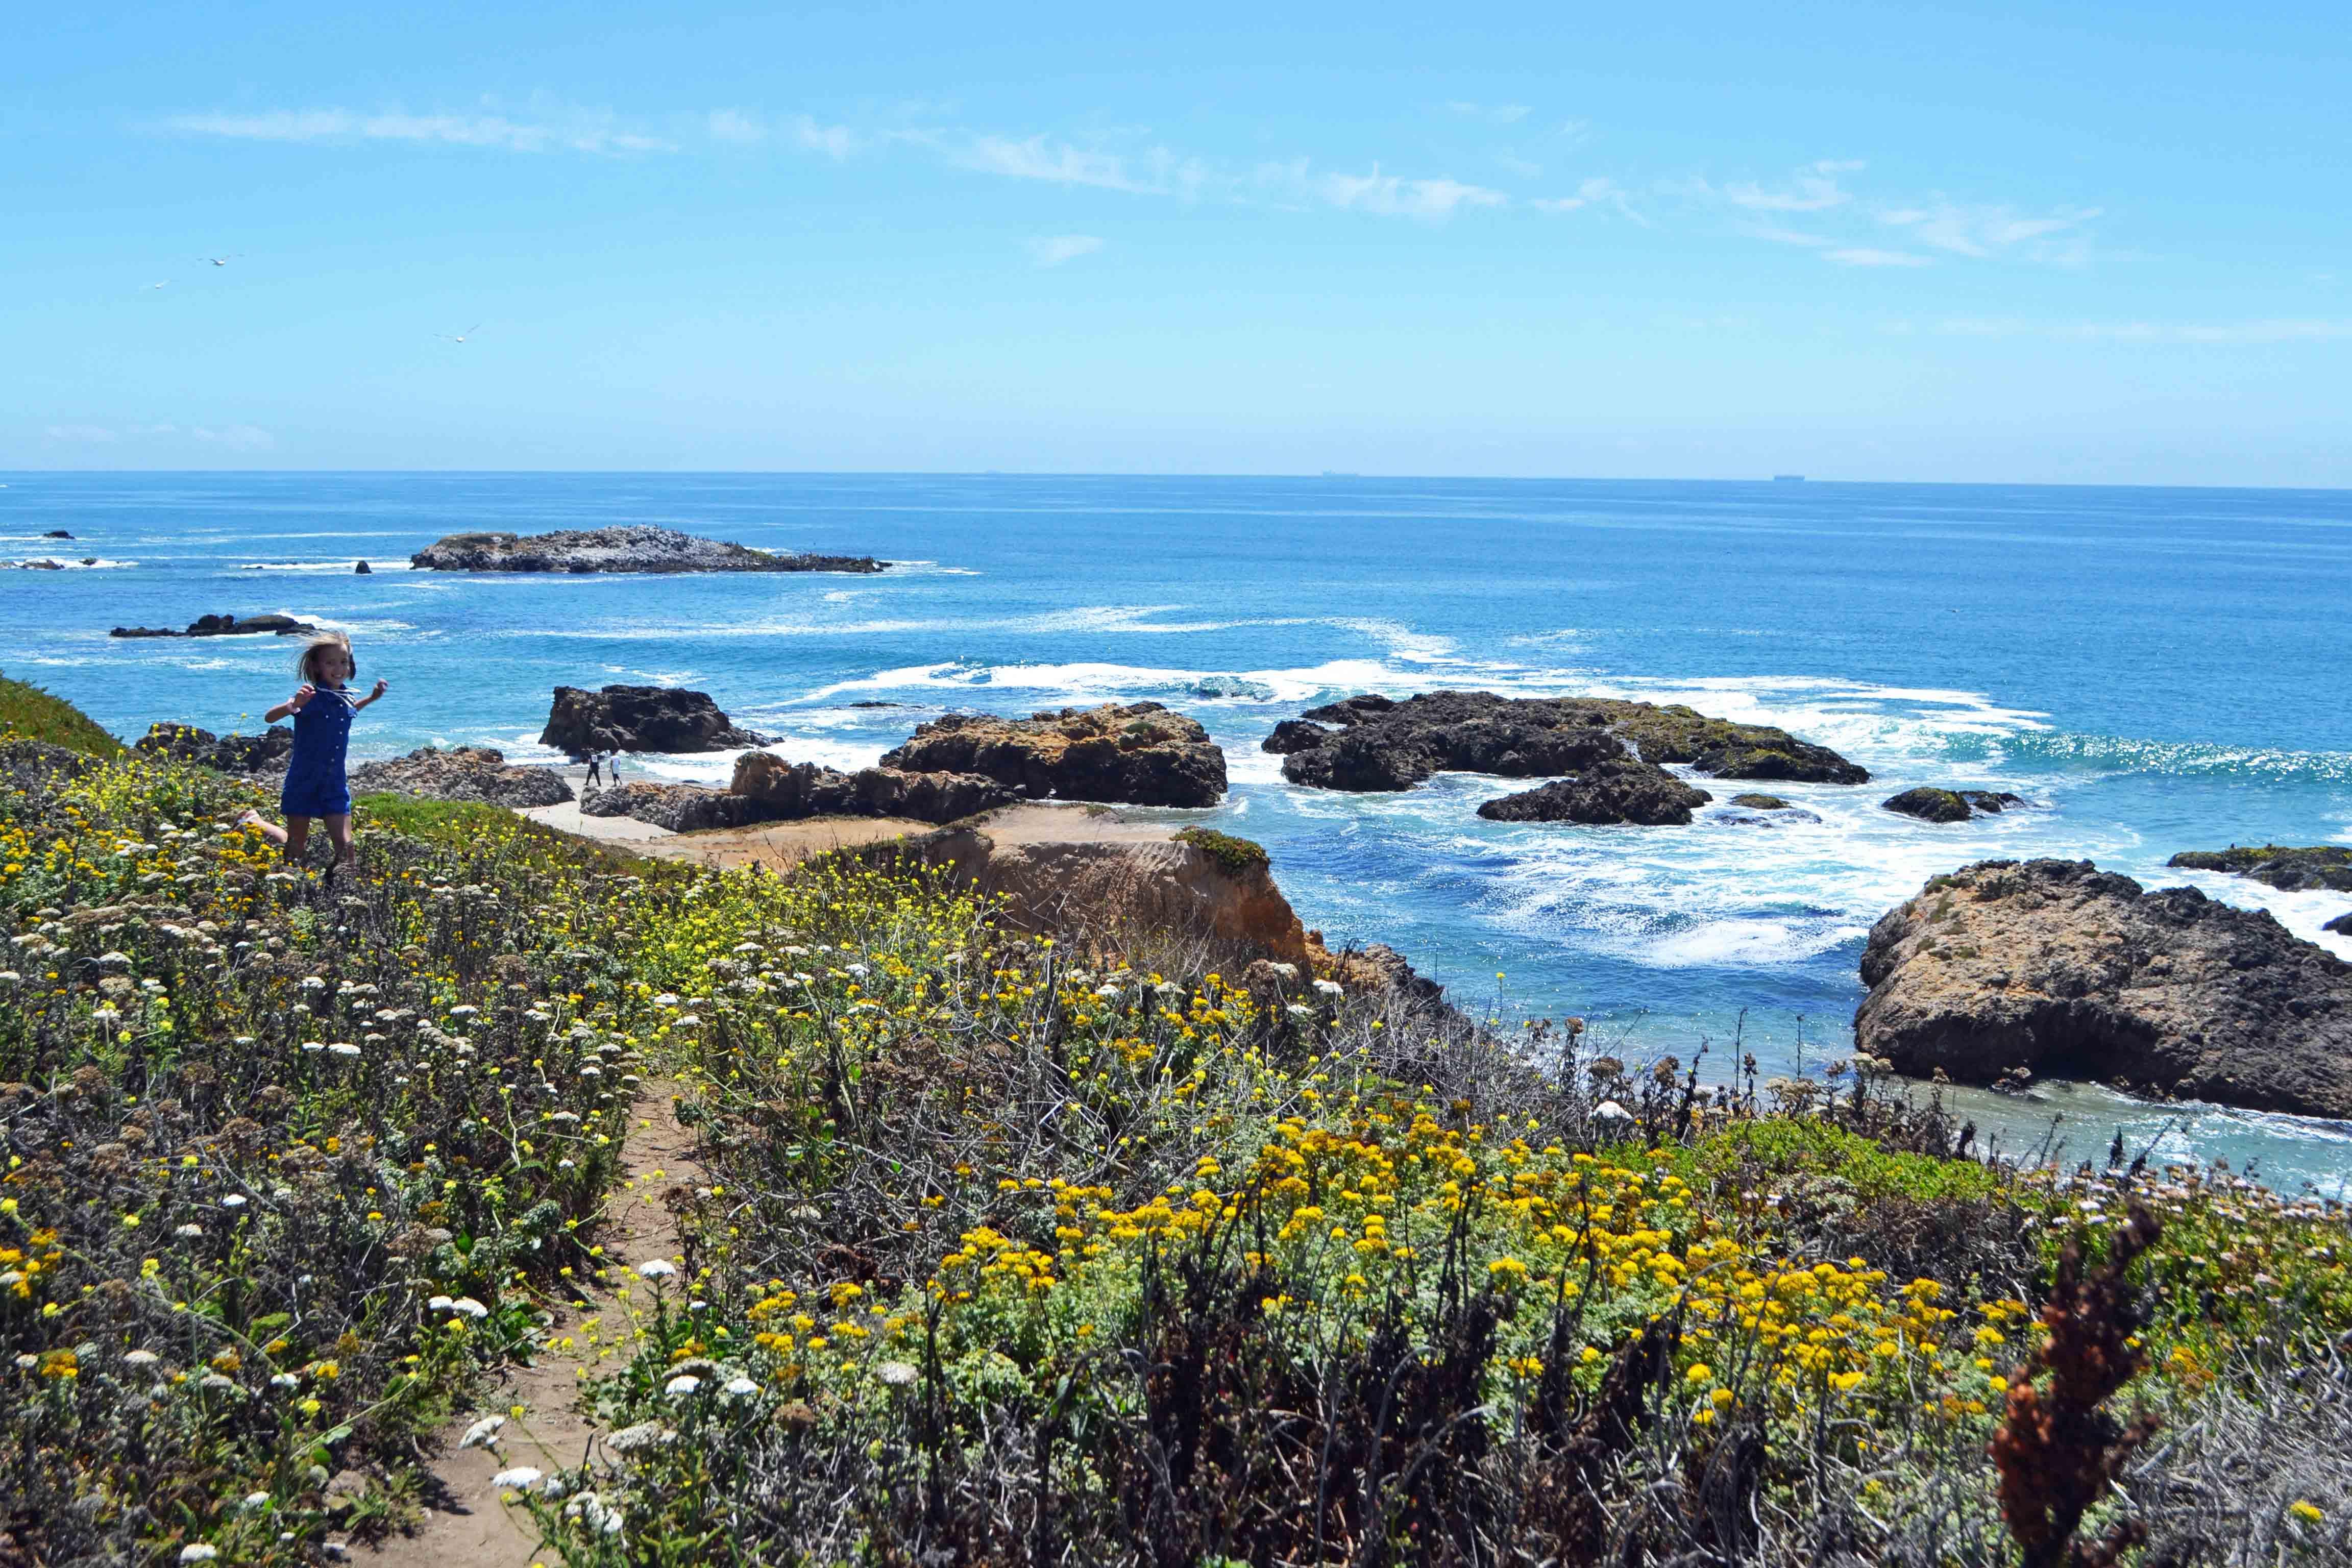 Pescadero Beach California Pacific Coast Highway 1 Road Trip Guide by Modern Honey. www.modernhoney.com